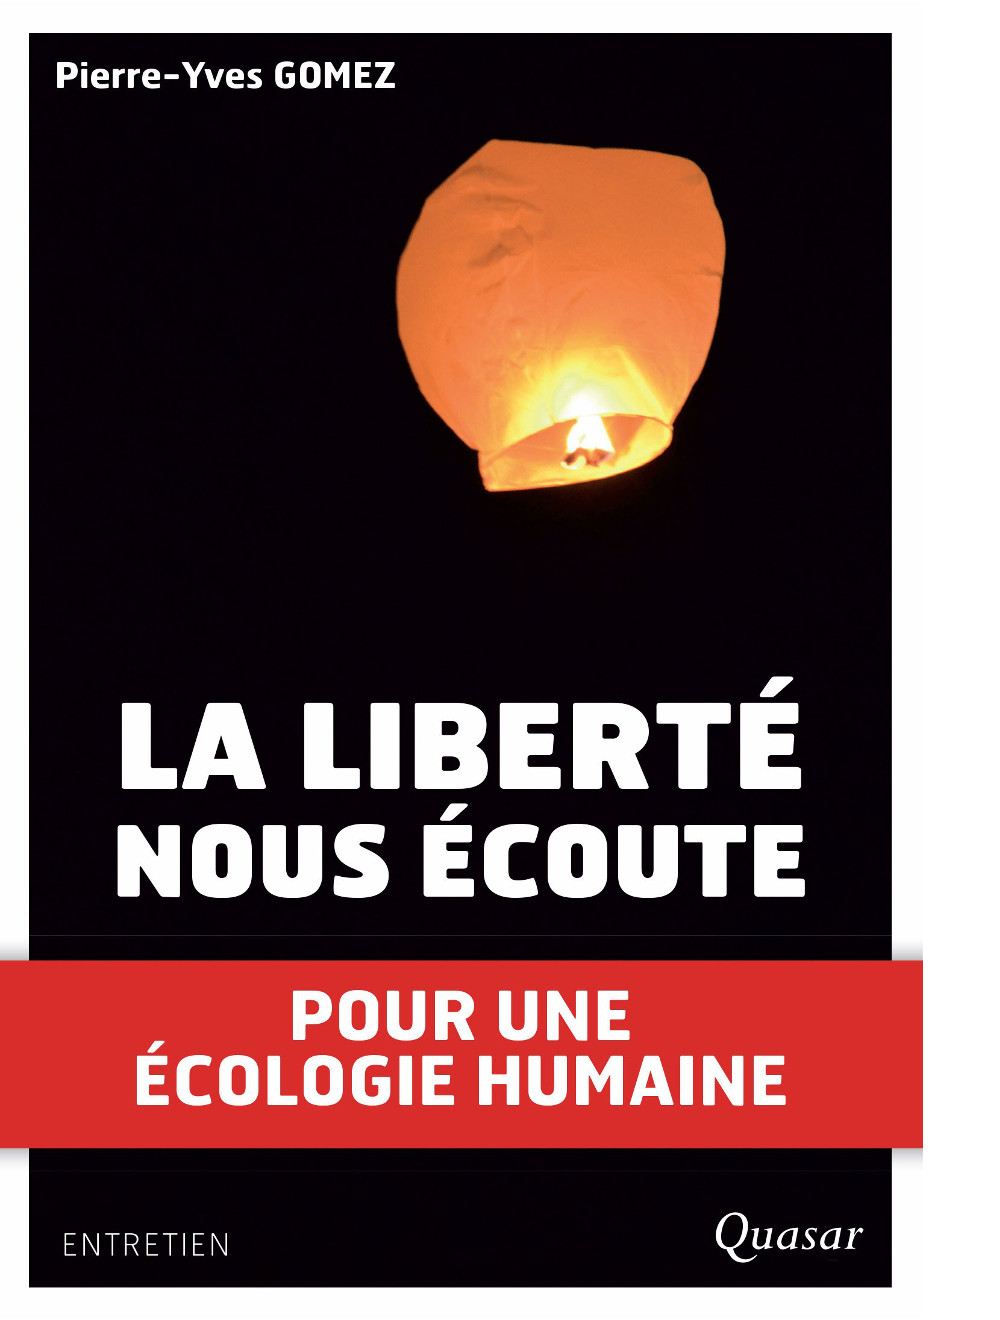 LiberteEcoute_Site